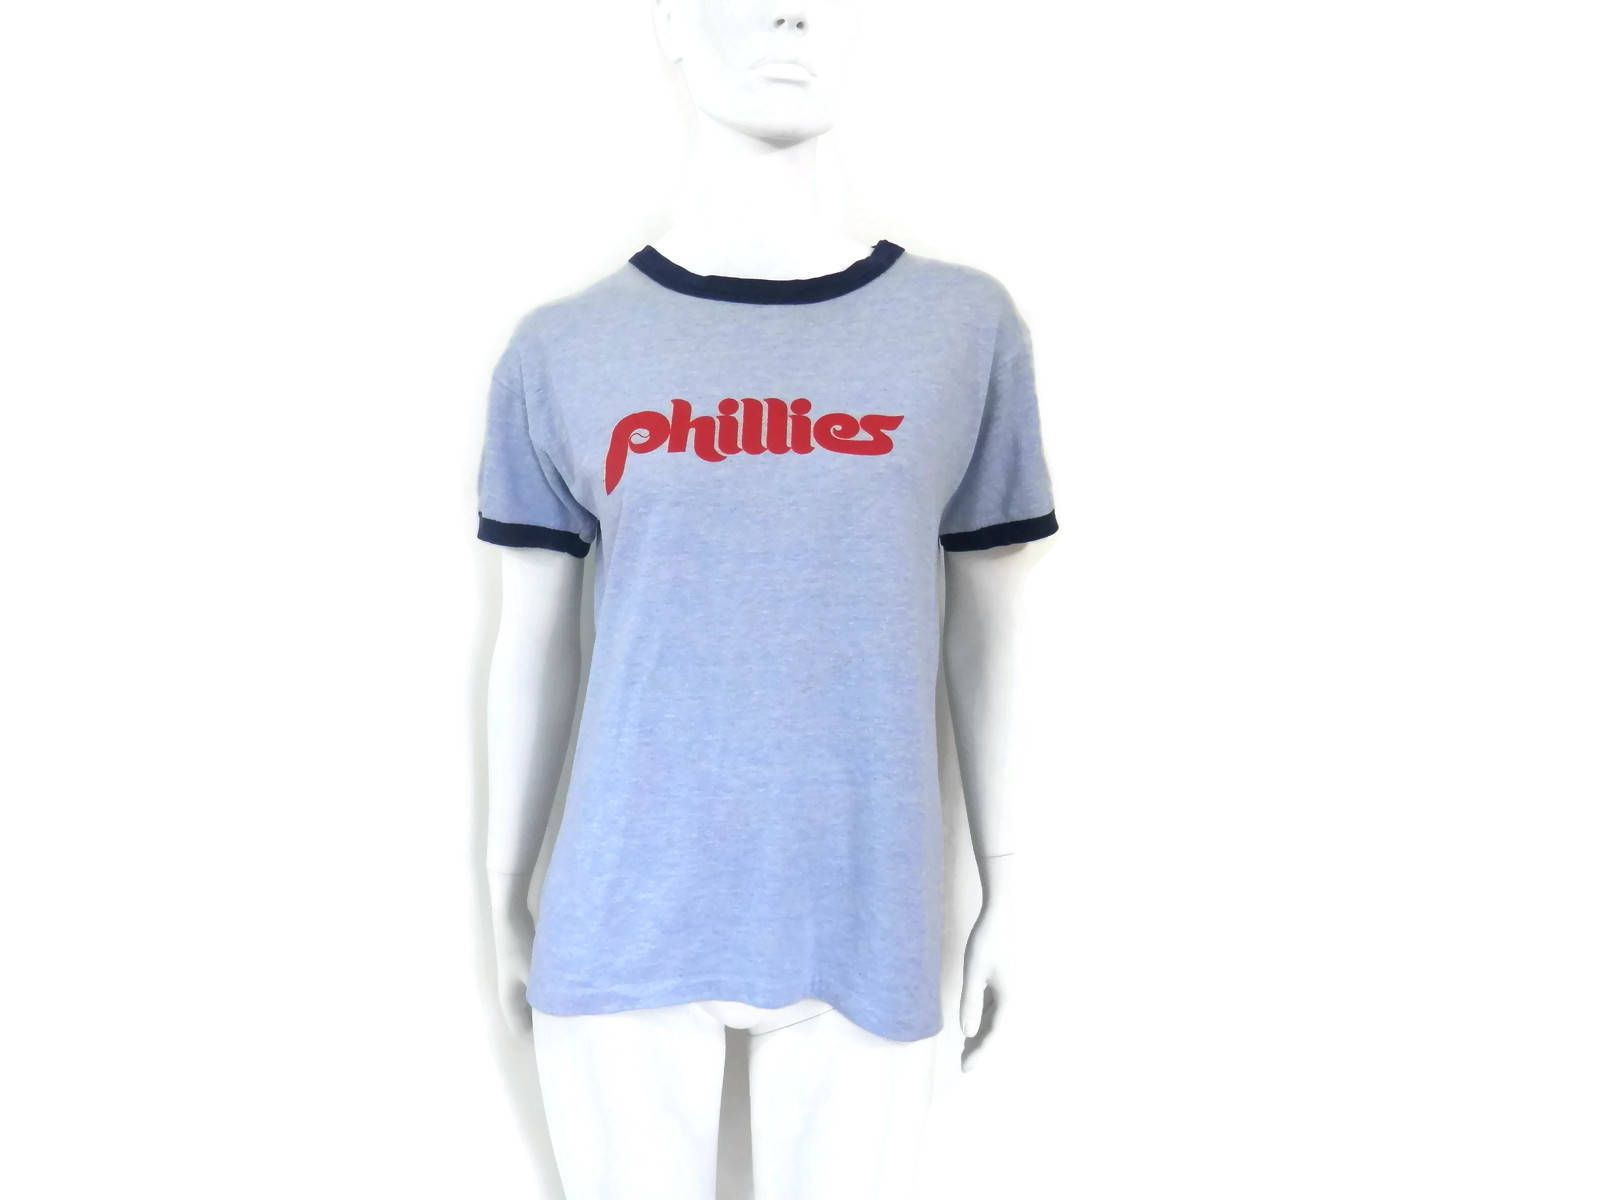 Vintage Phillies Tee Shirt 1980's Old School Sports